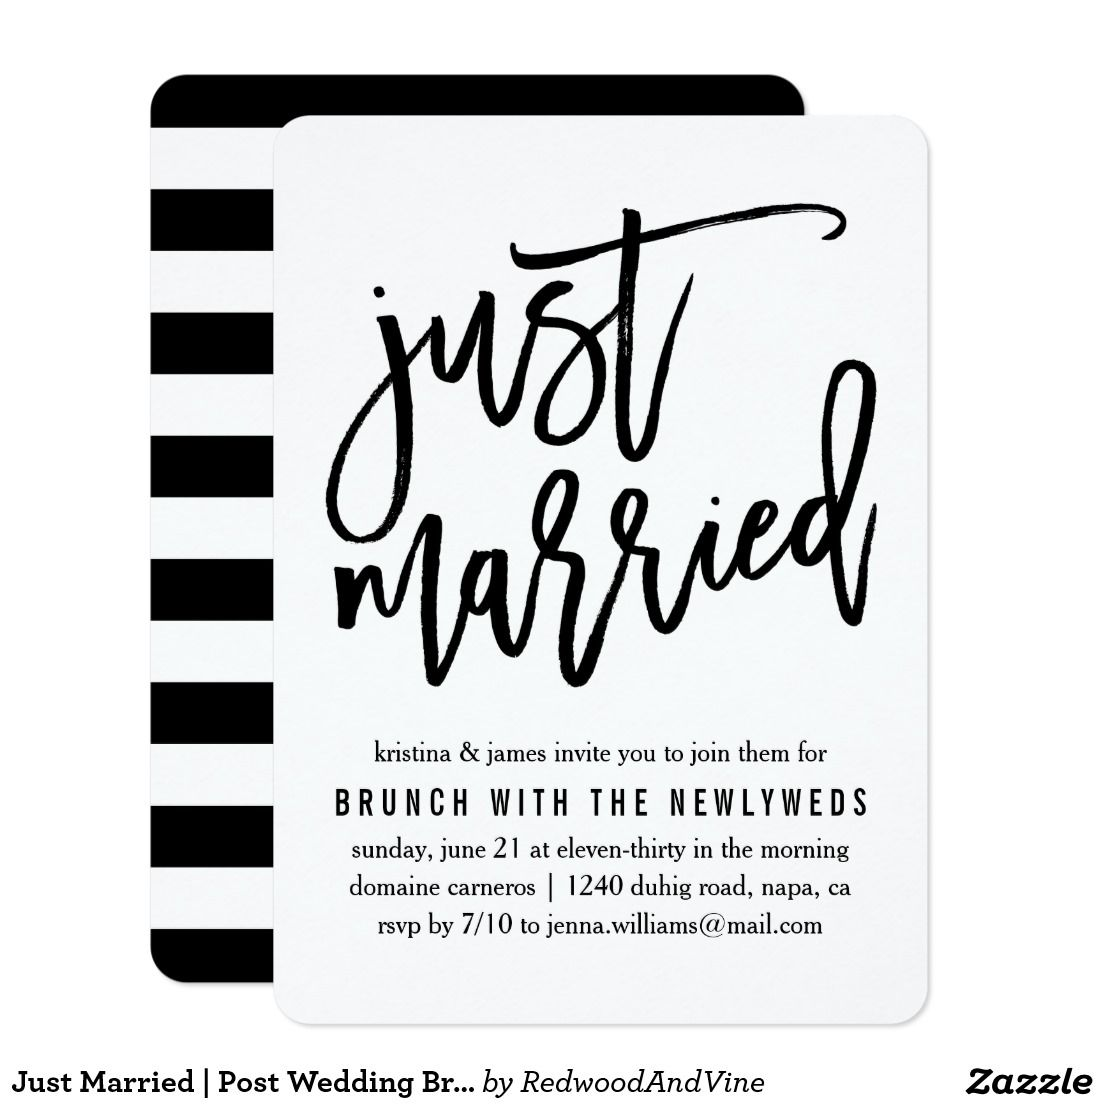 Just Married | Post Wedding Brunch Invitation | Pinterest | Brunch ...